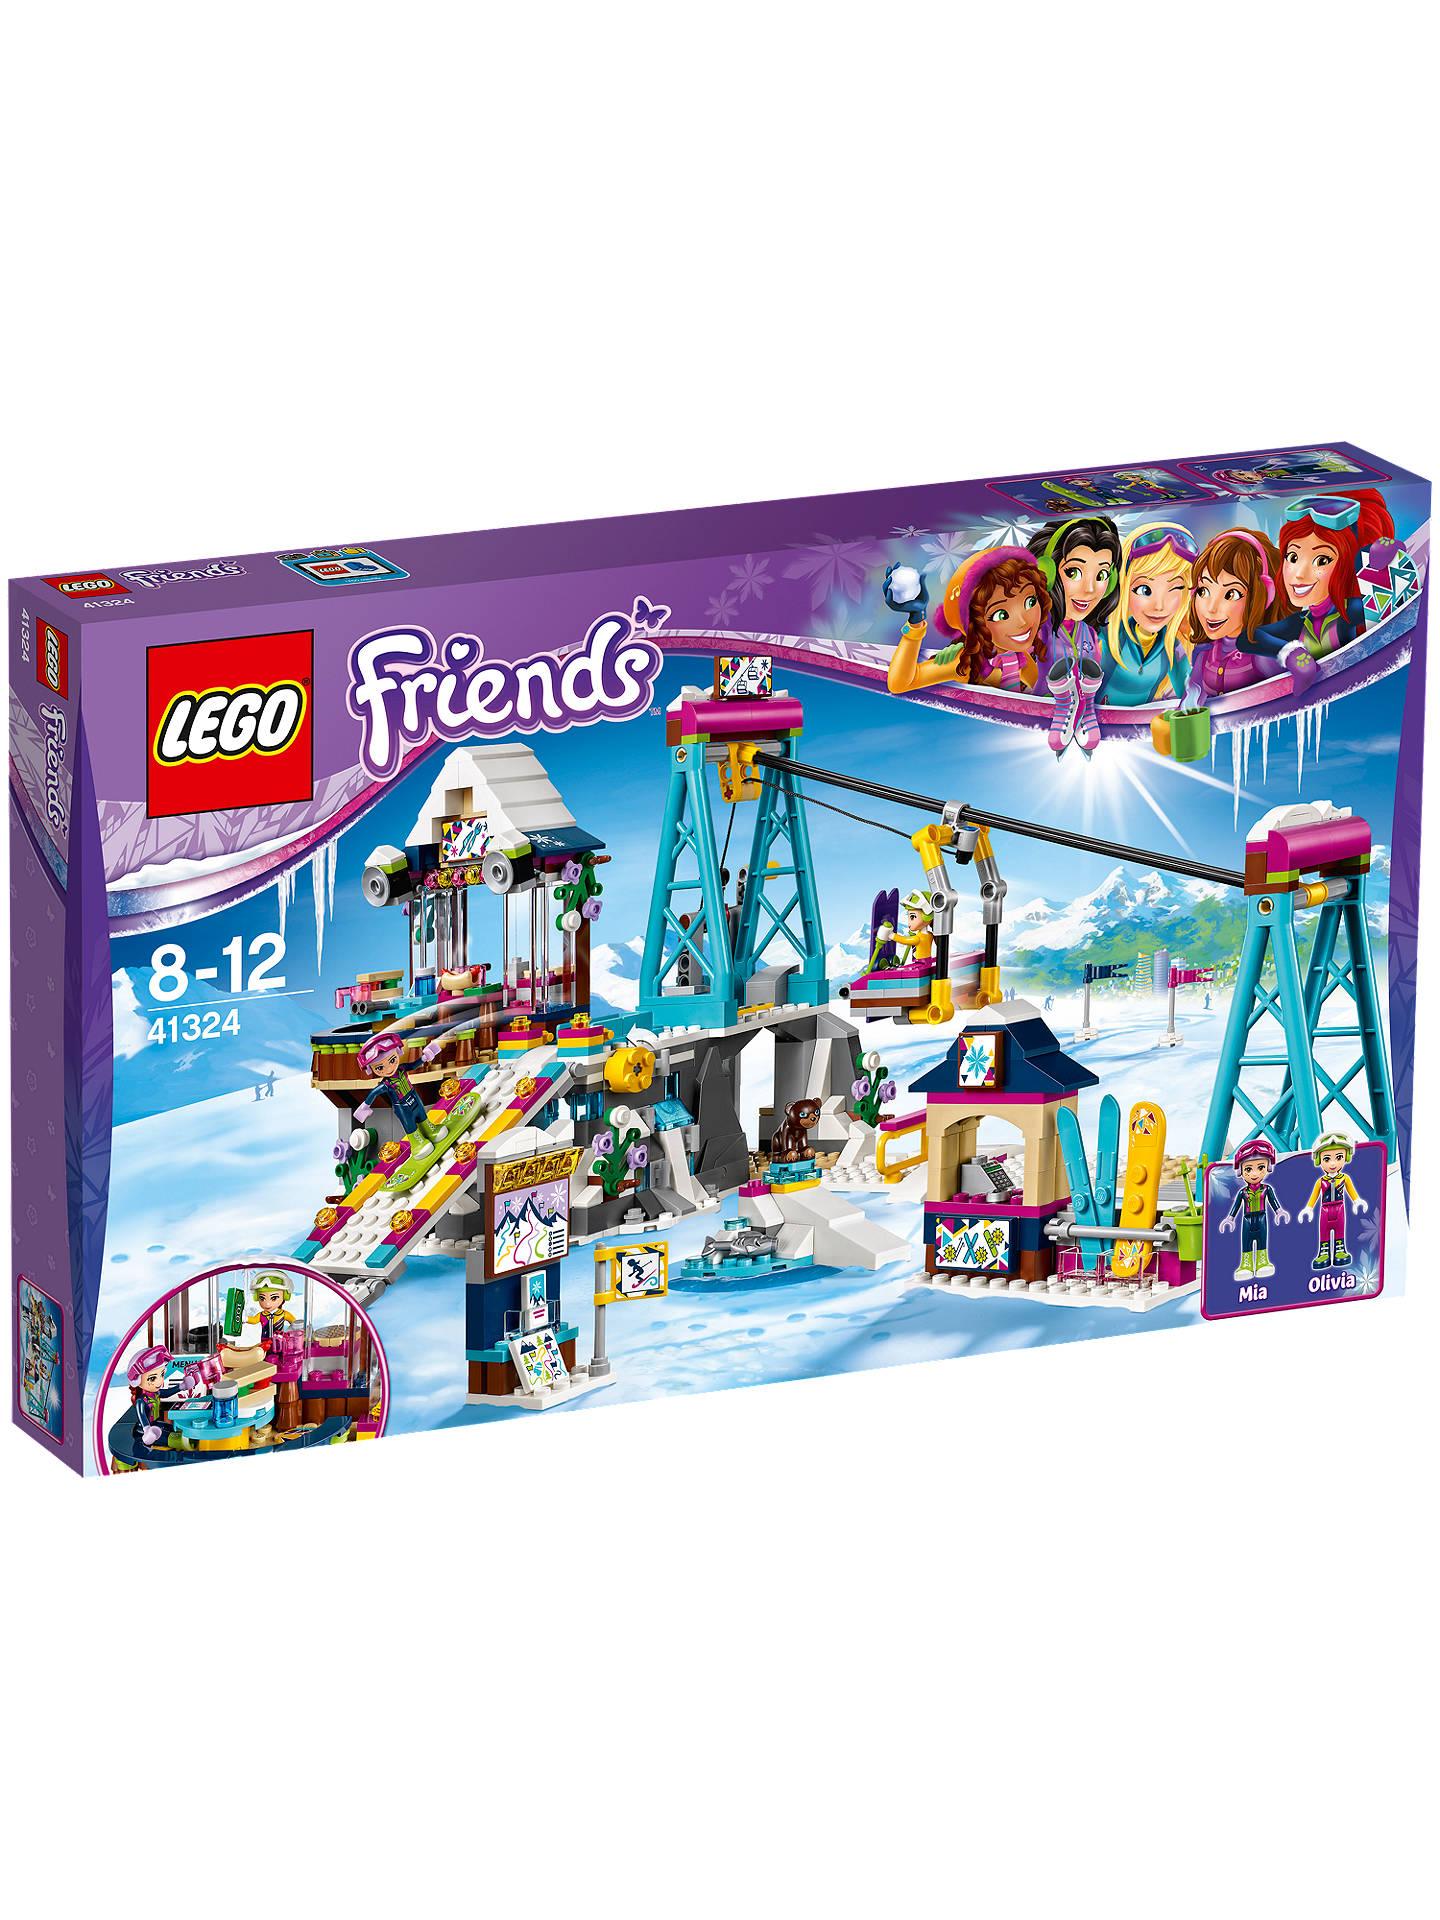 Lego Friends 41324 Snow Resort Ski Lift At John Lewis Partners